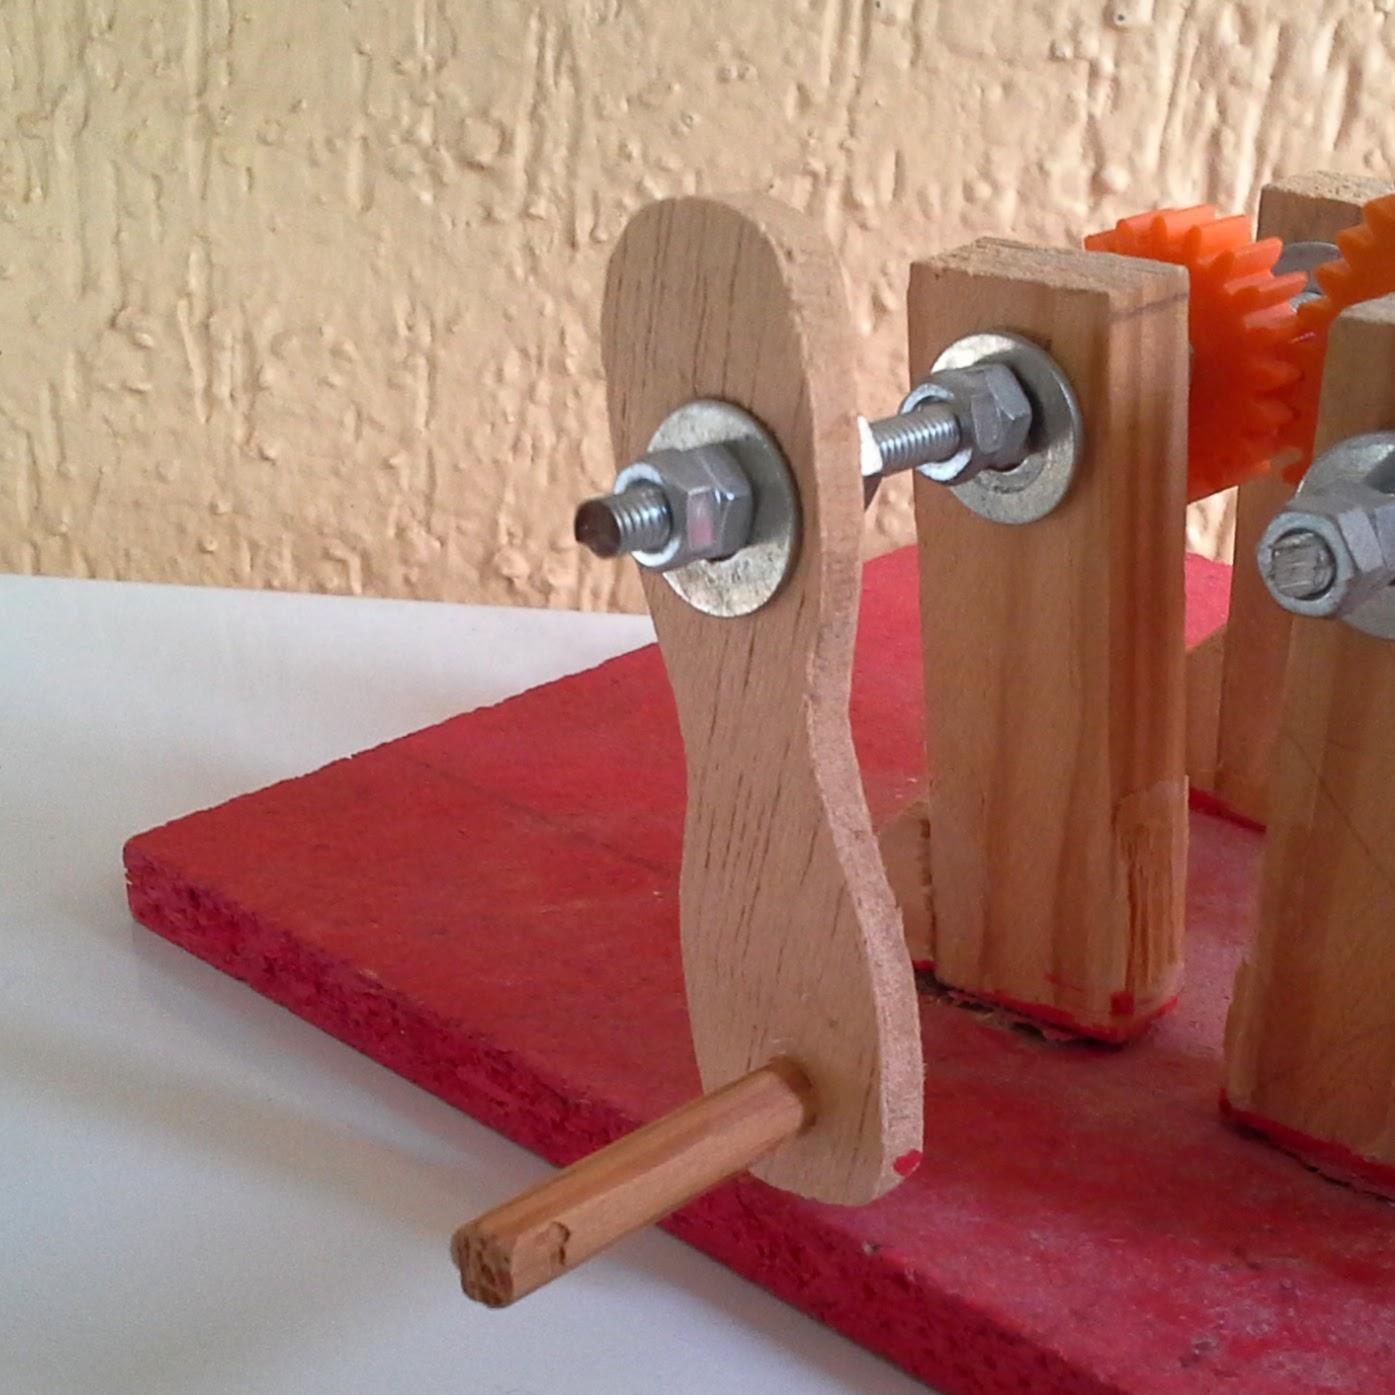 Proyectos de tecnolog a c mo fabricar una manivela for Material para toldo